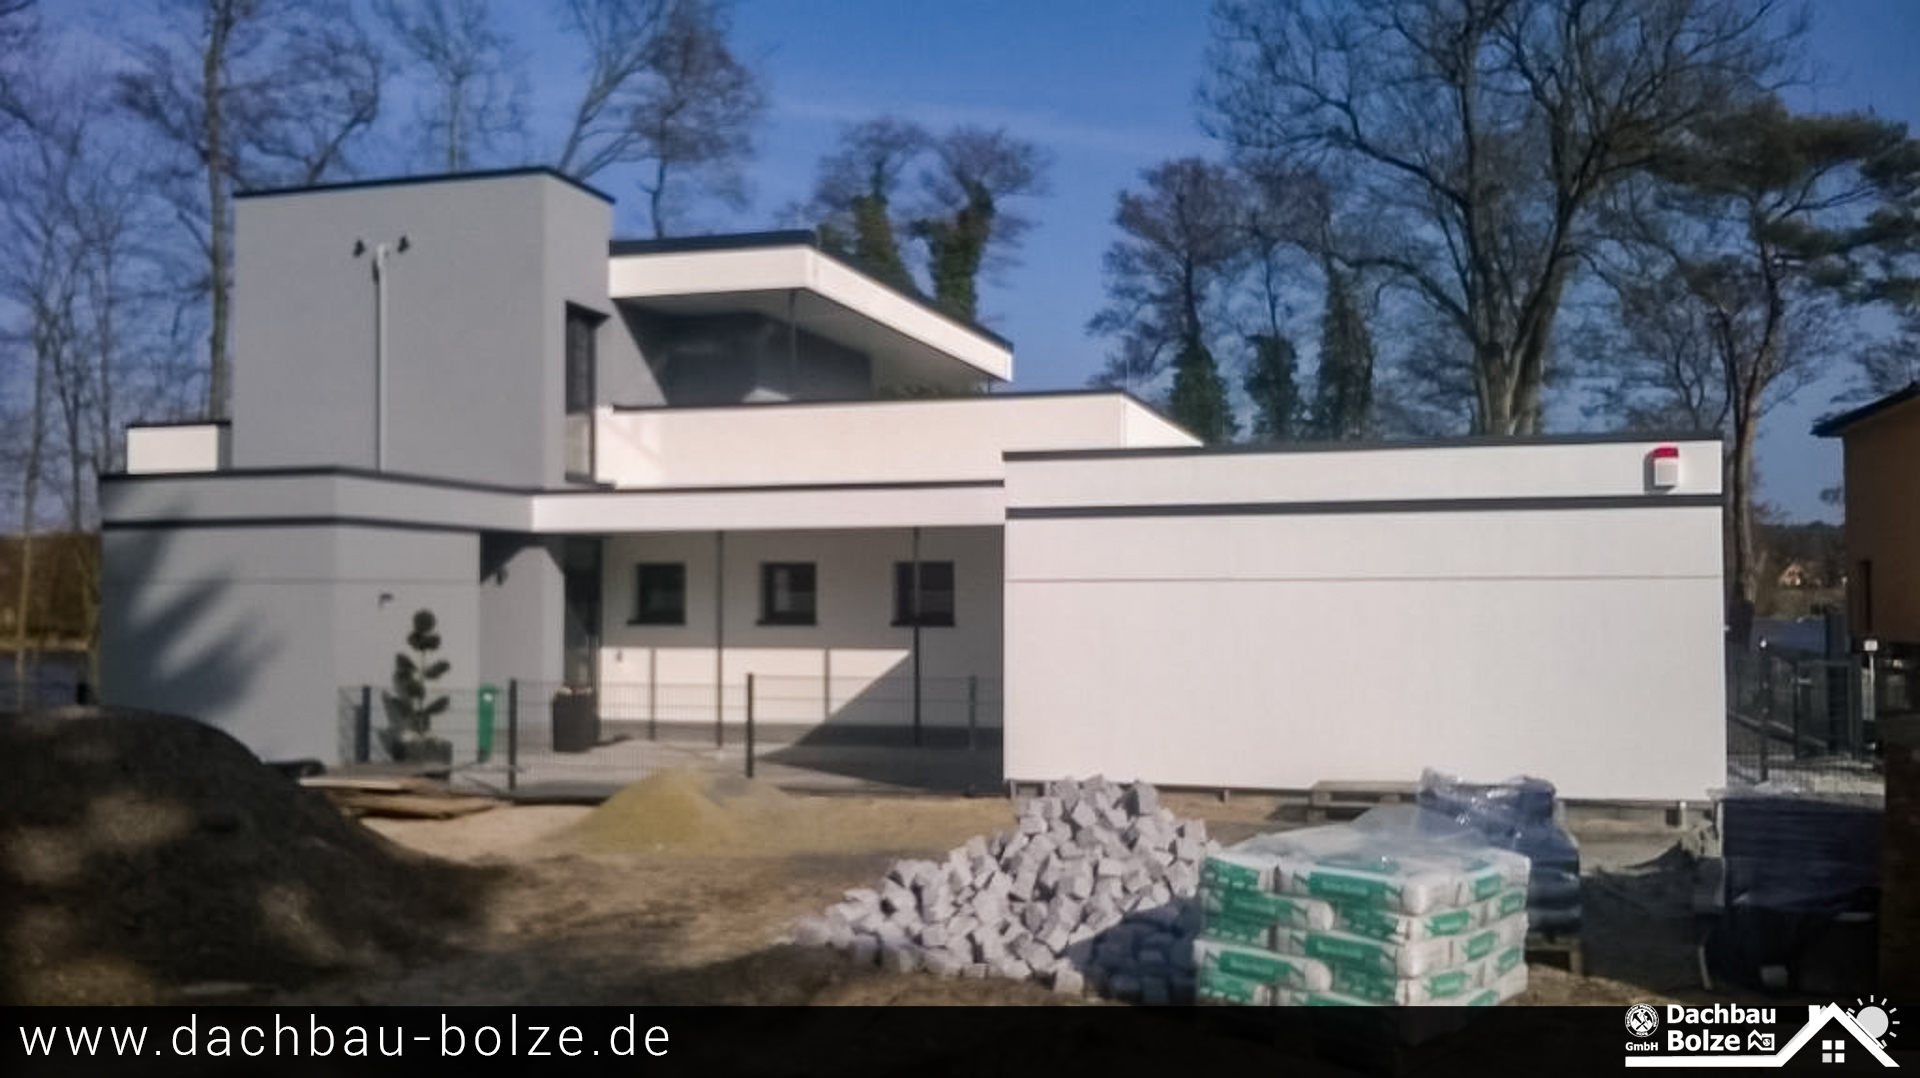 Flachdach mit Bitumenbahnen Dachbau-Bolze